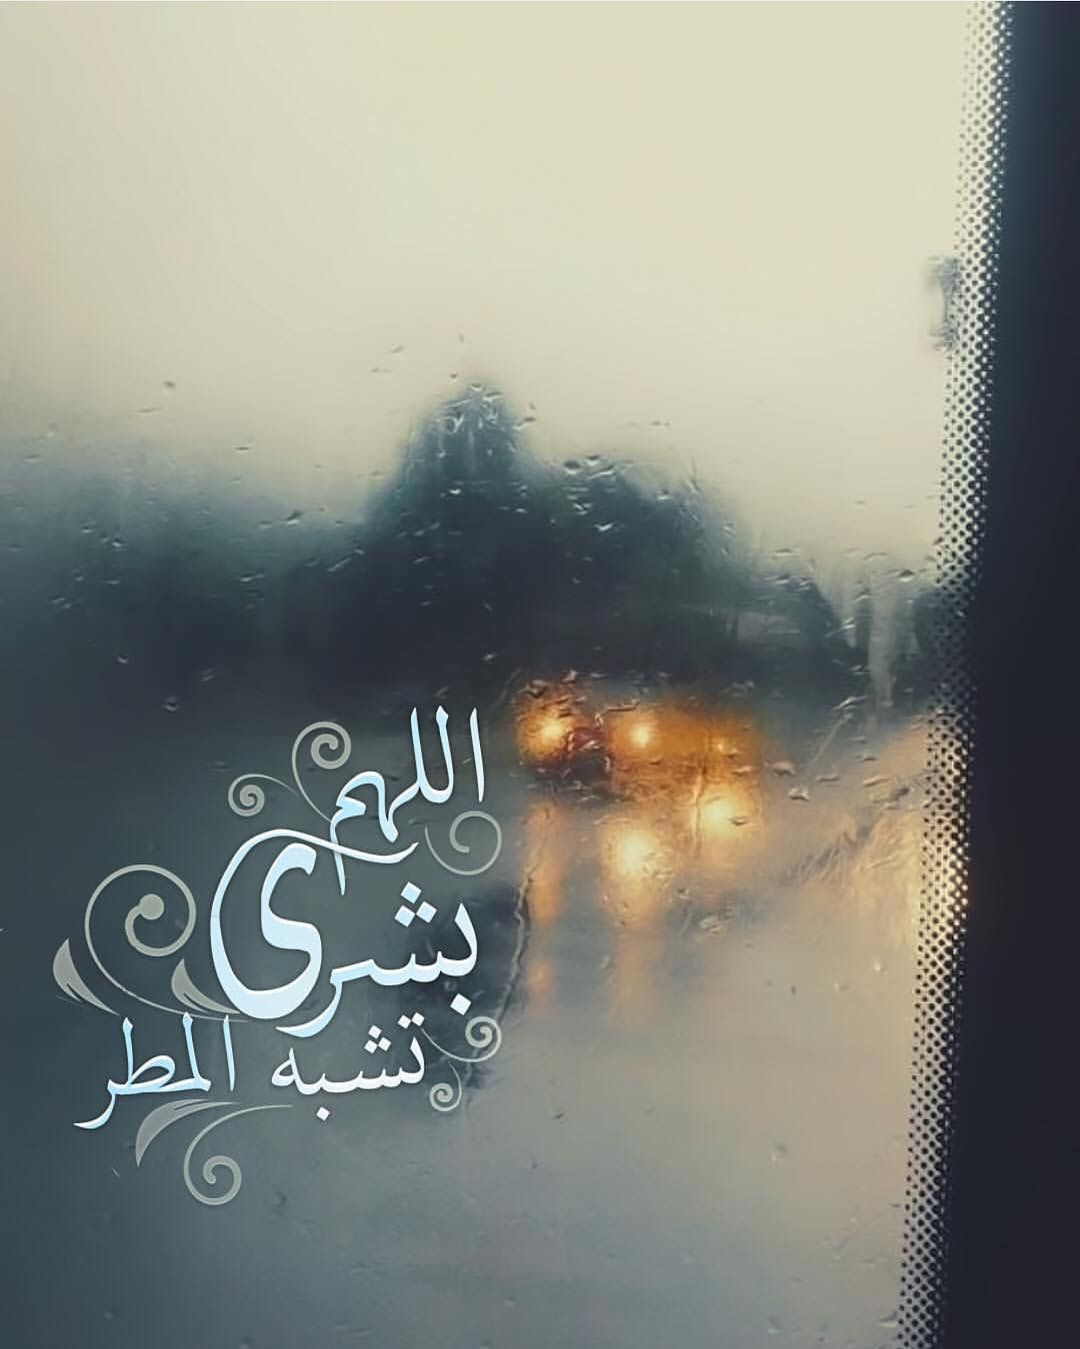 Pin By Salma On المطر Rain Neon Signs Neon